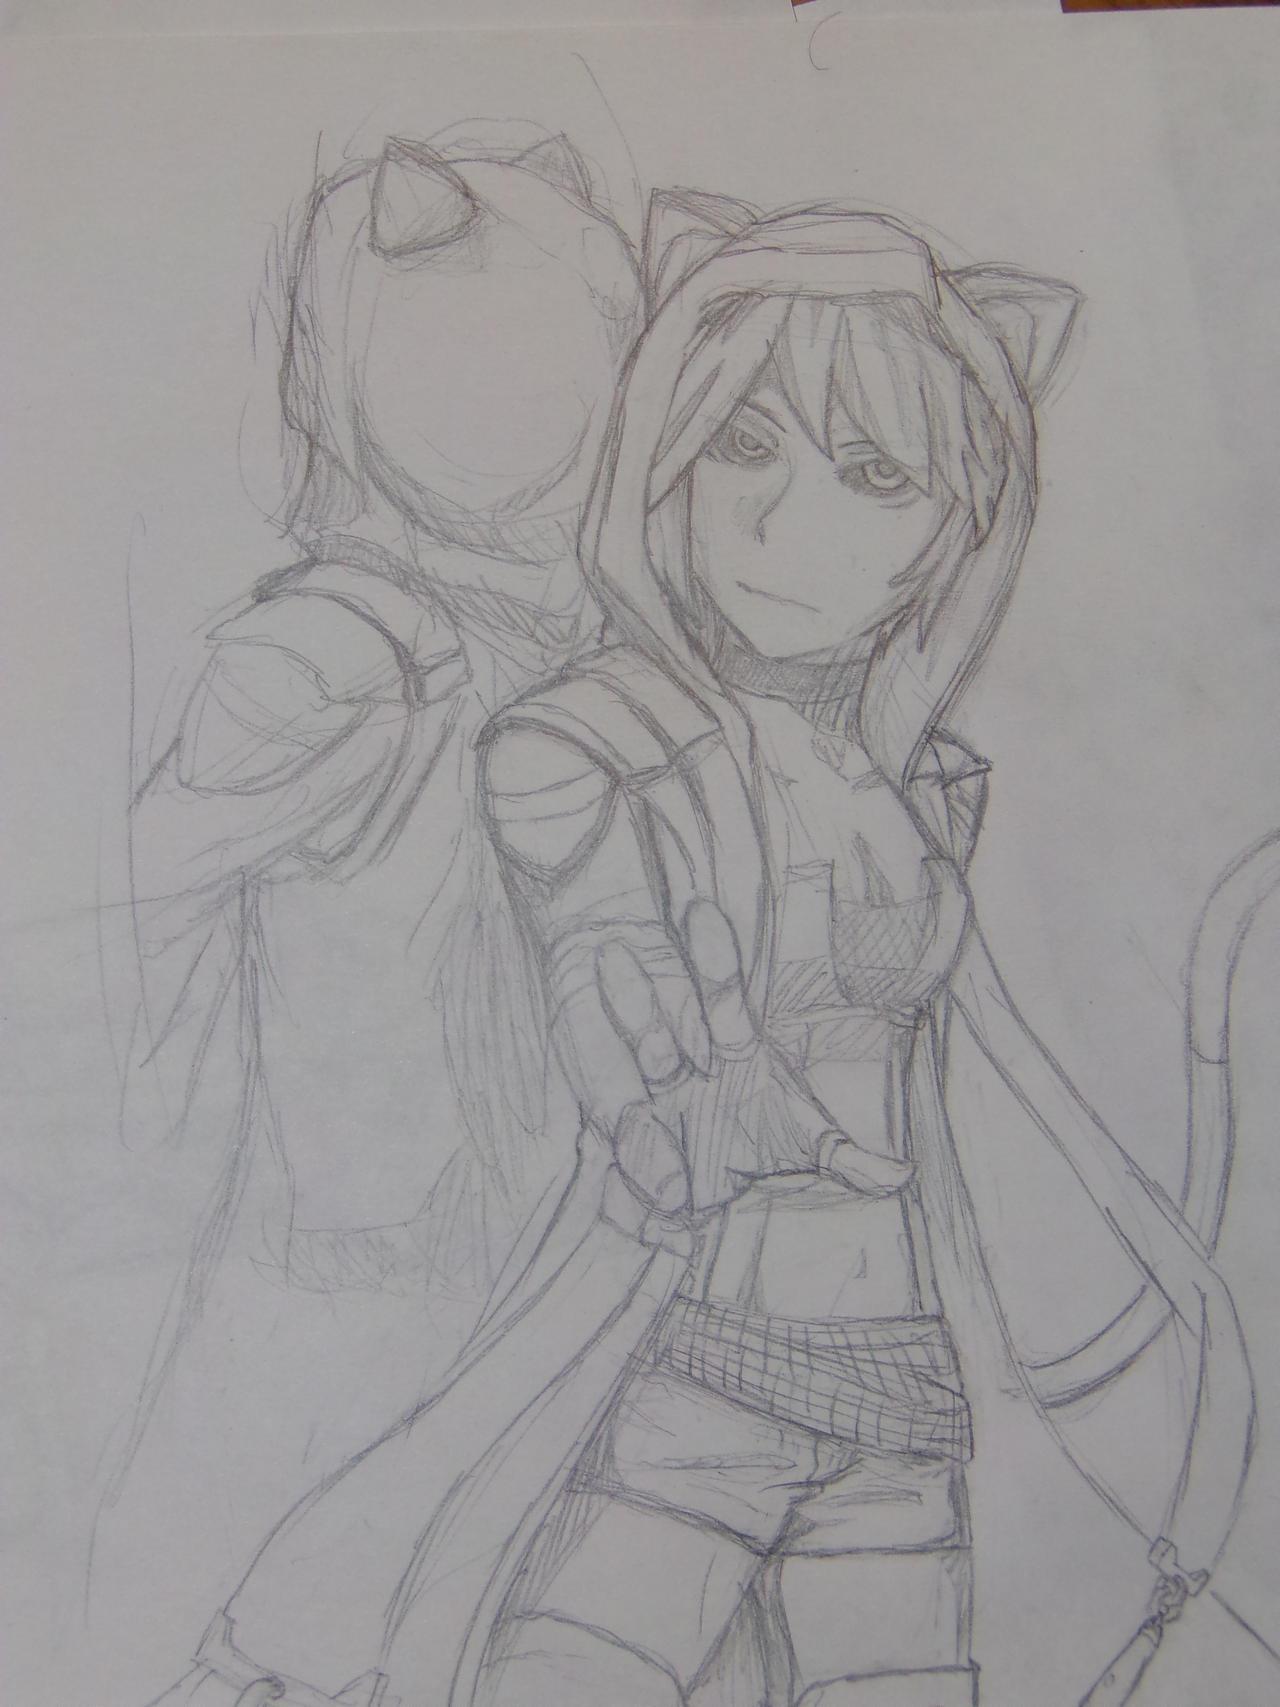 working -  Midori by A-Fistful-Of-Kittens